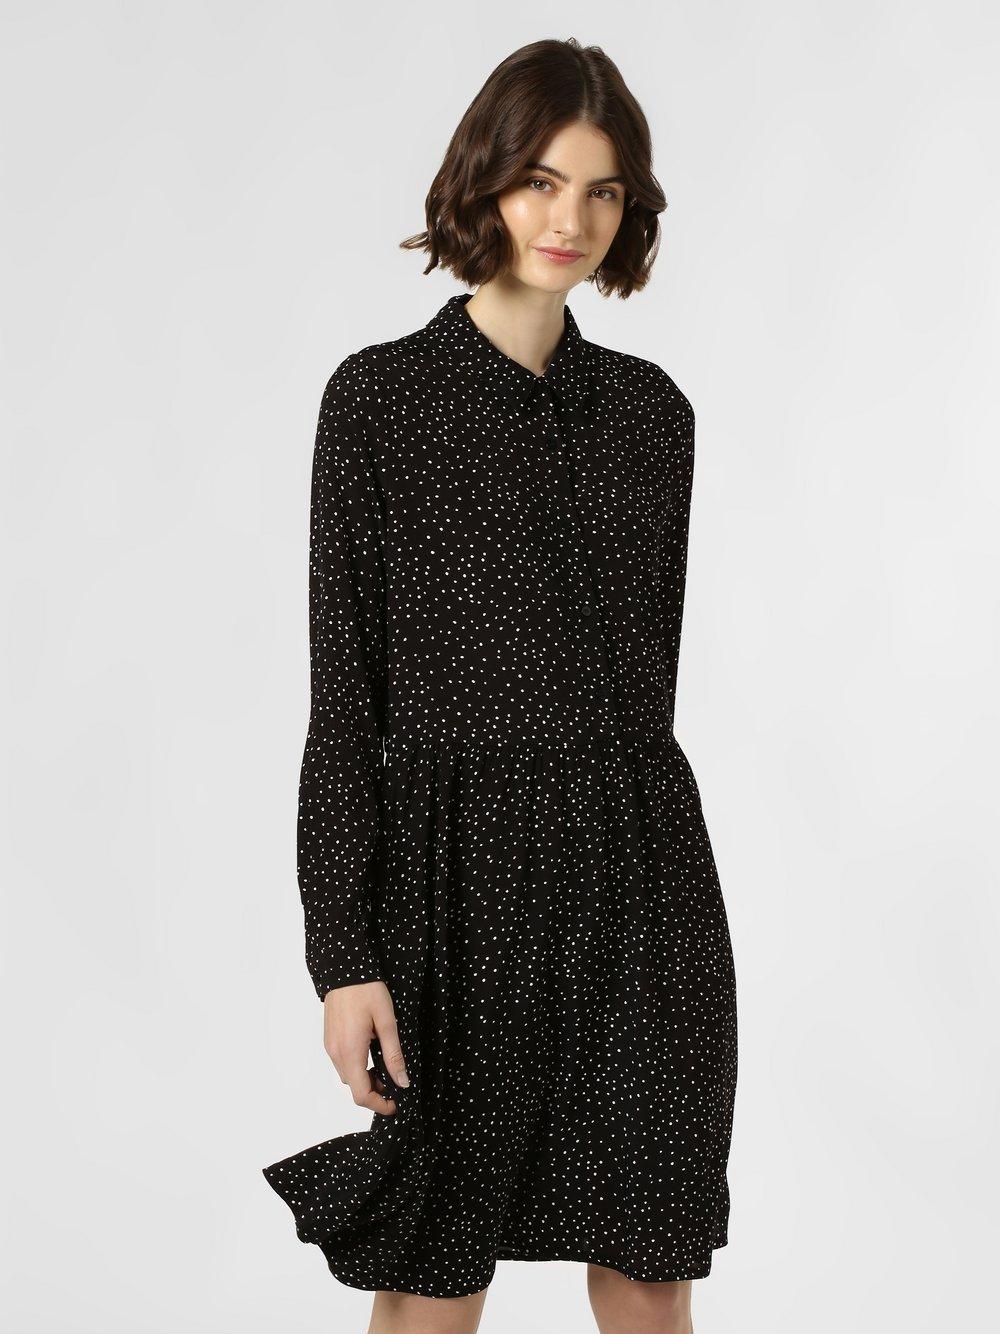 Minimum - Sukienka damska – Bindie, czarny